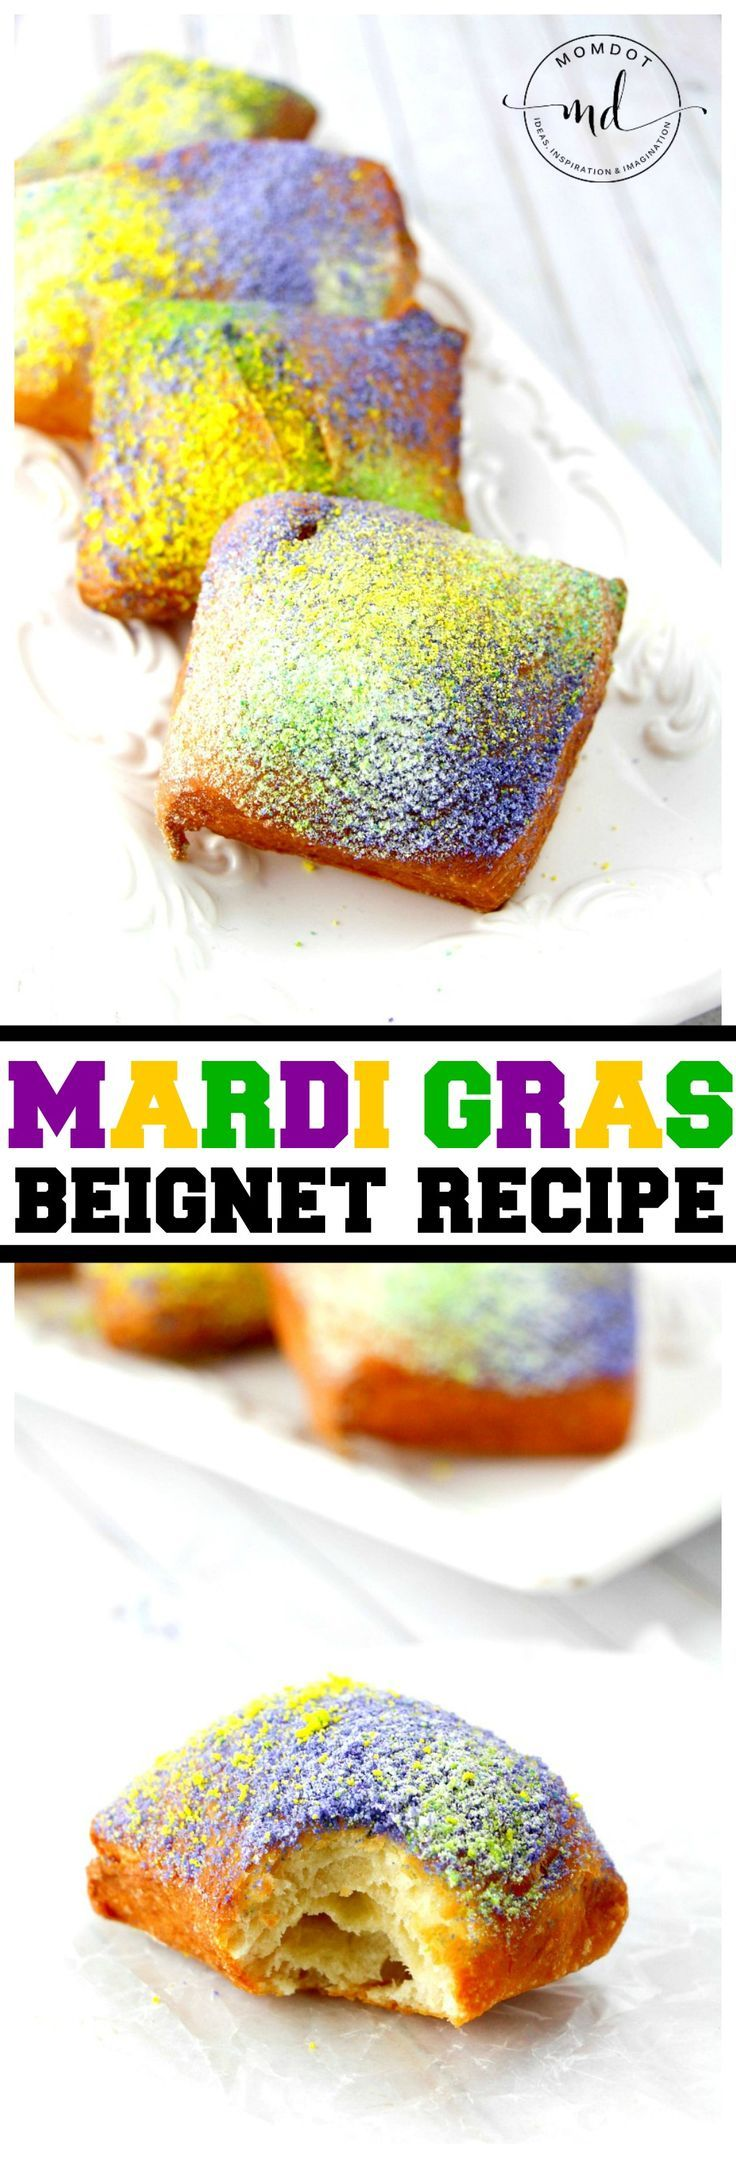 Mardi Gras Beignet Recipe, simple beignet recipe that copycake Cafe Du Monde New Orleans style